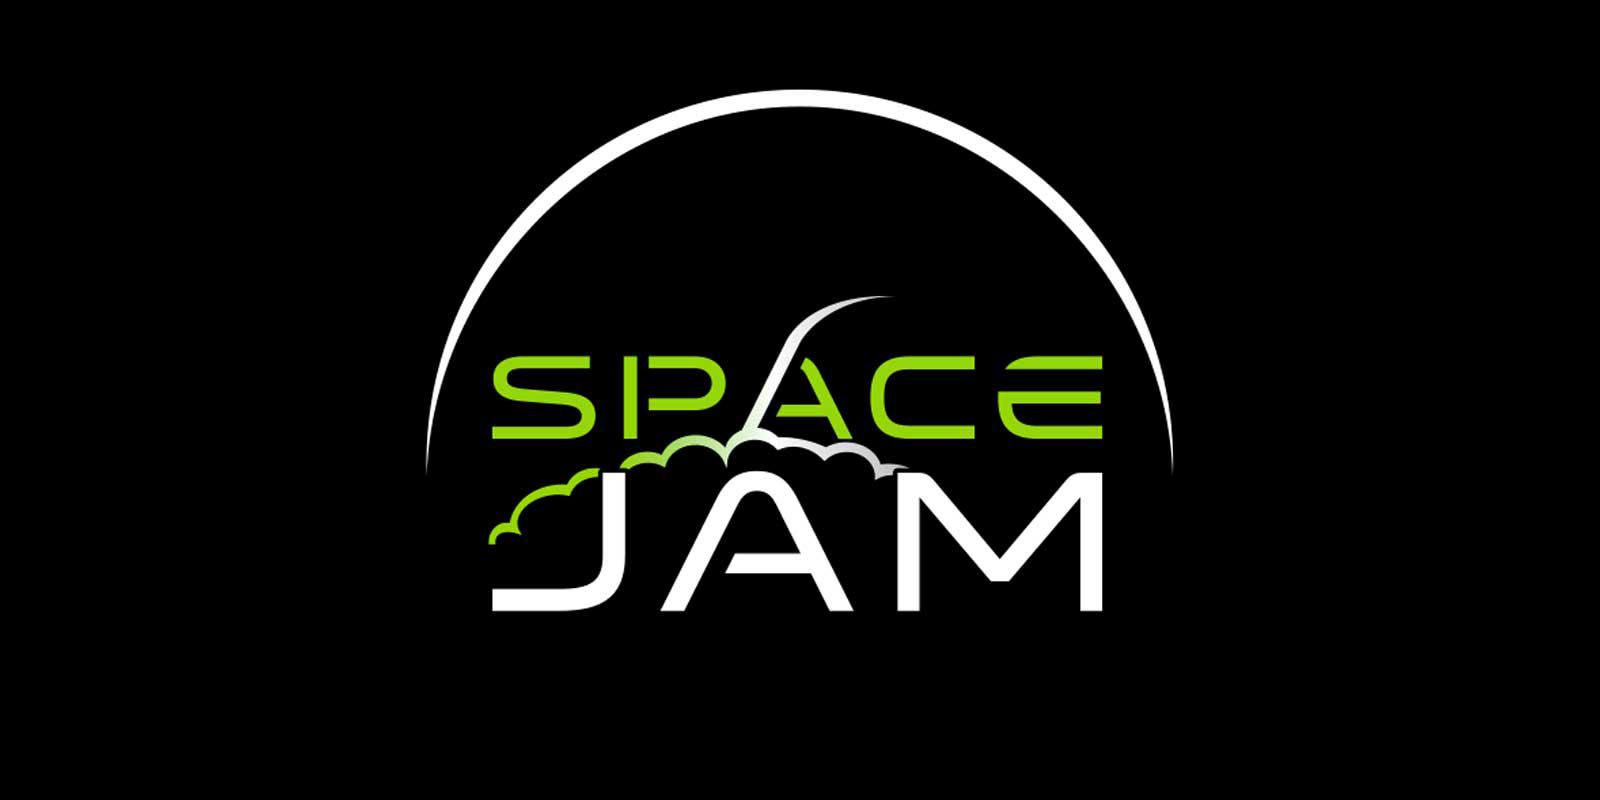 Space Jam Juice logo